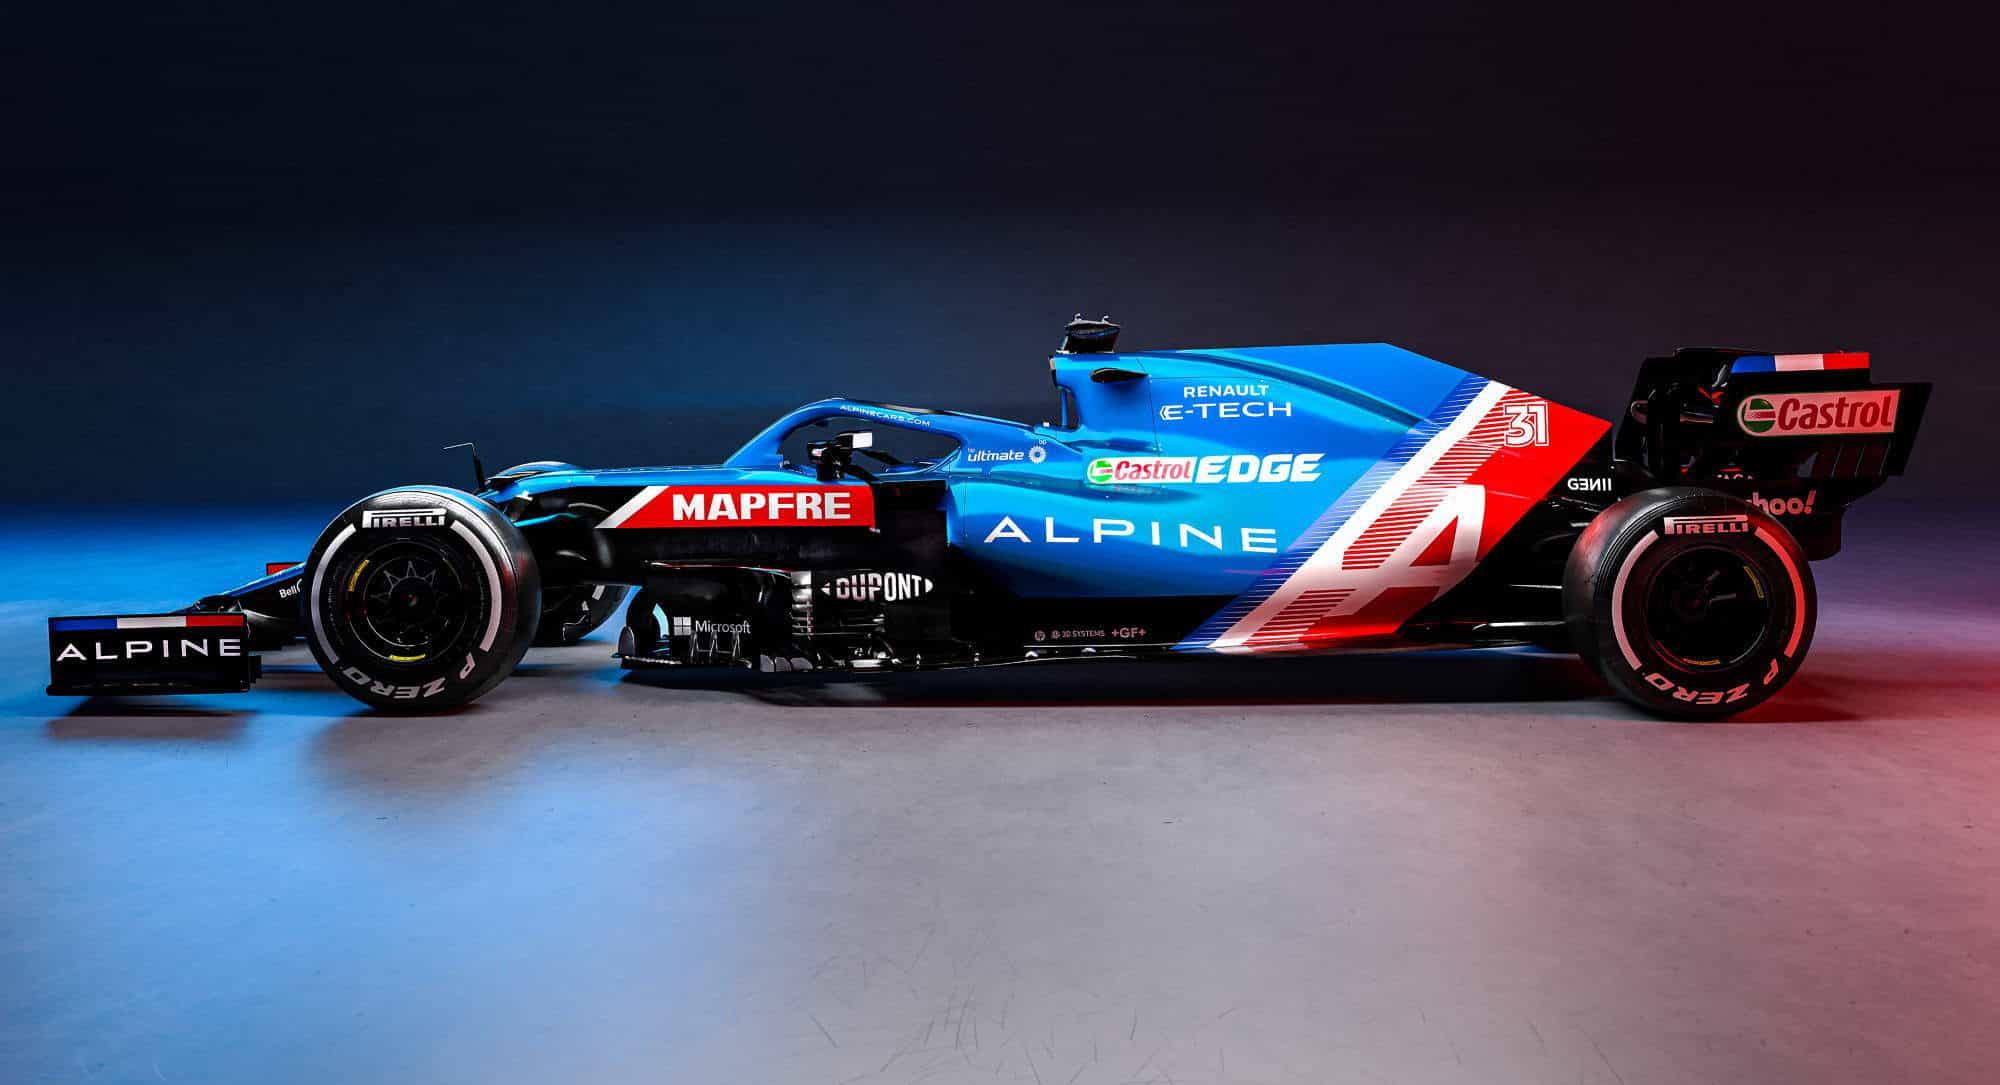 2021 Alpine F1 2021 car AT521 side Photo Alpine